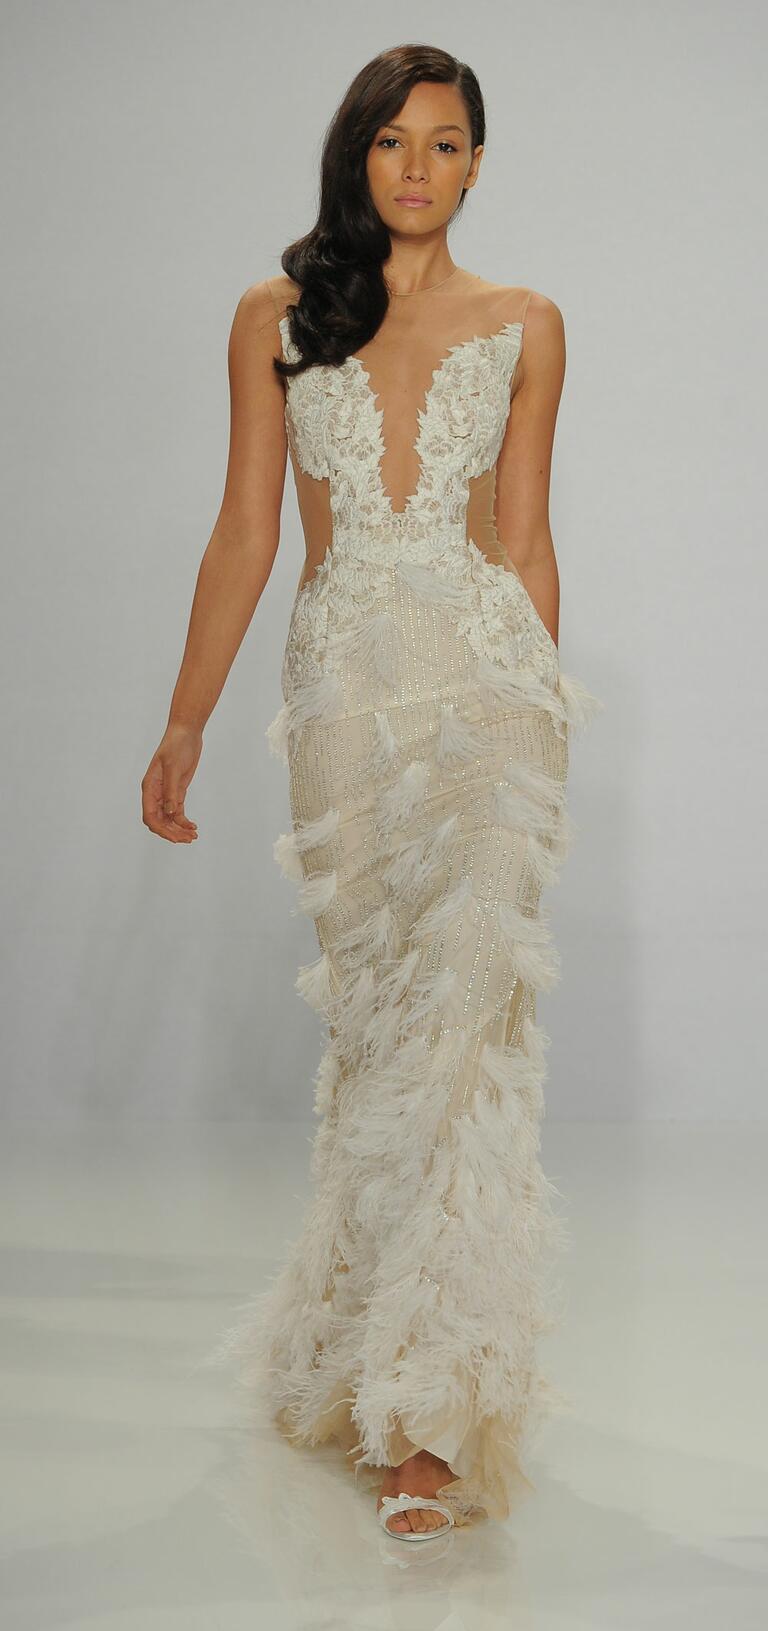 Christian Siriano Spring 2017 feather illusion wedding dress